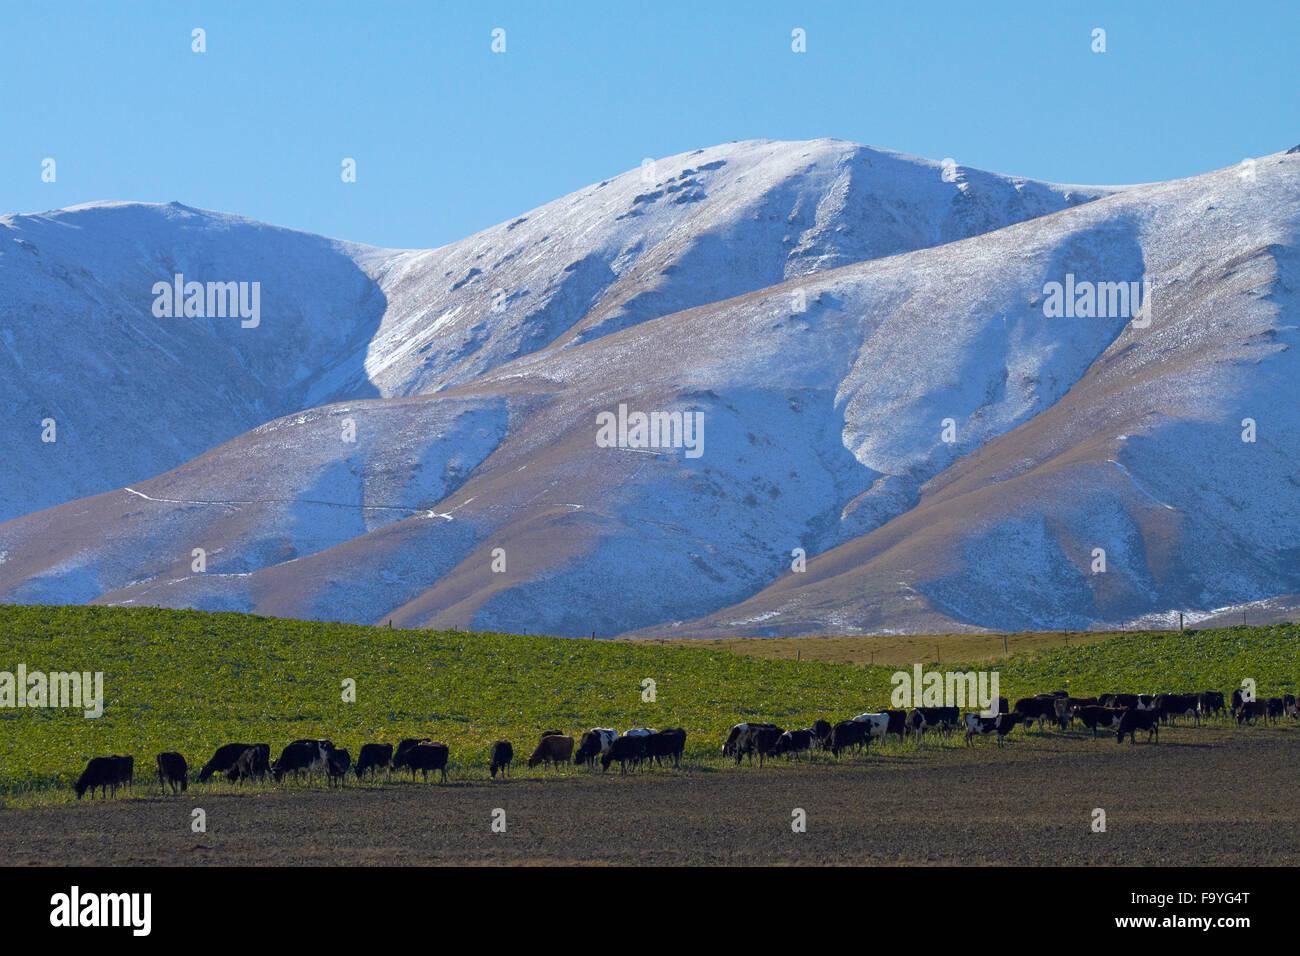 Cows and Kakanui Mountains, Kyeburn, near Ranfurly, Maniototo, Central Otago, South Island, New Zealand - Stock Image